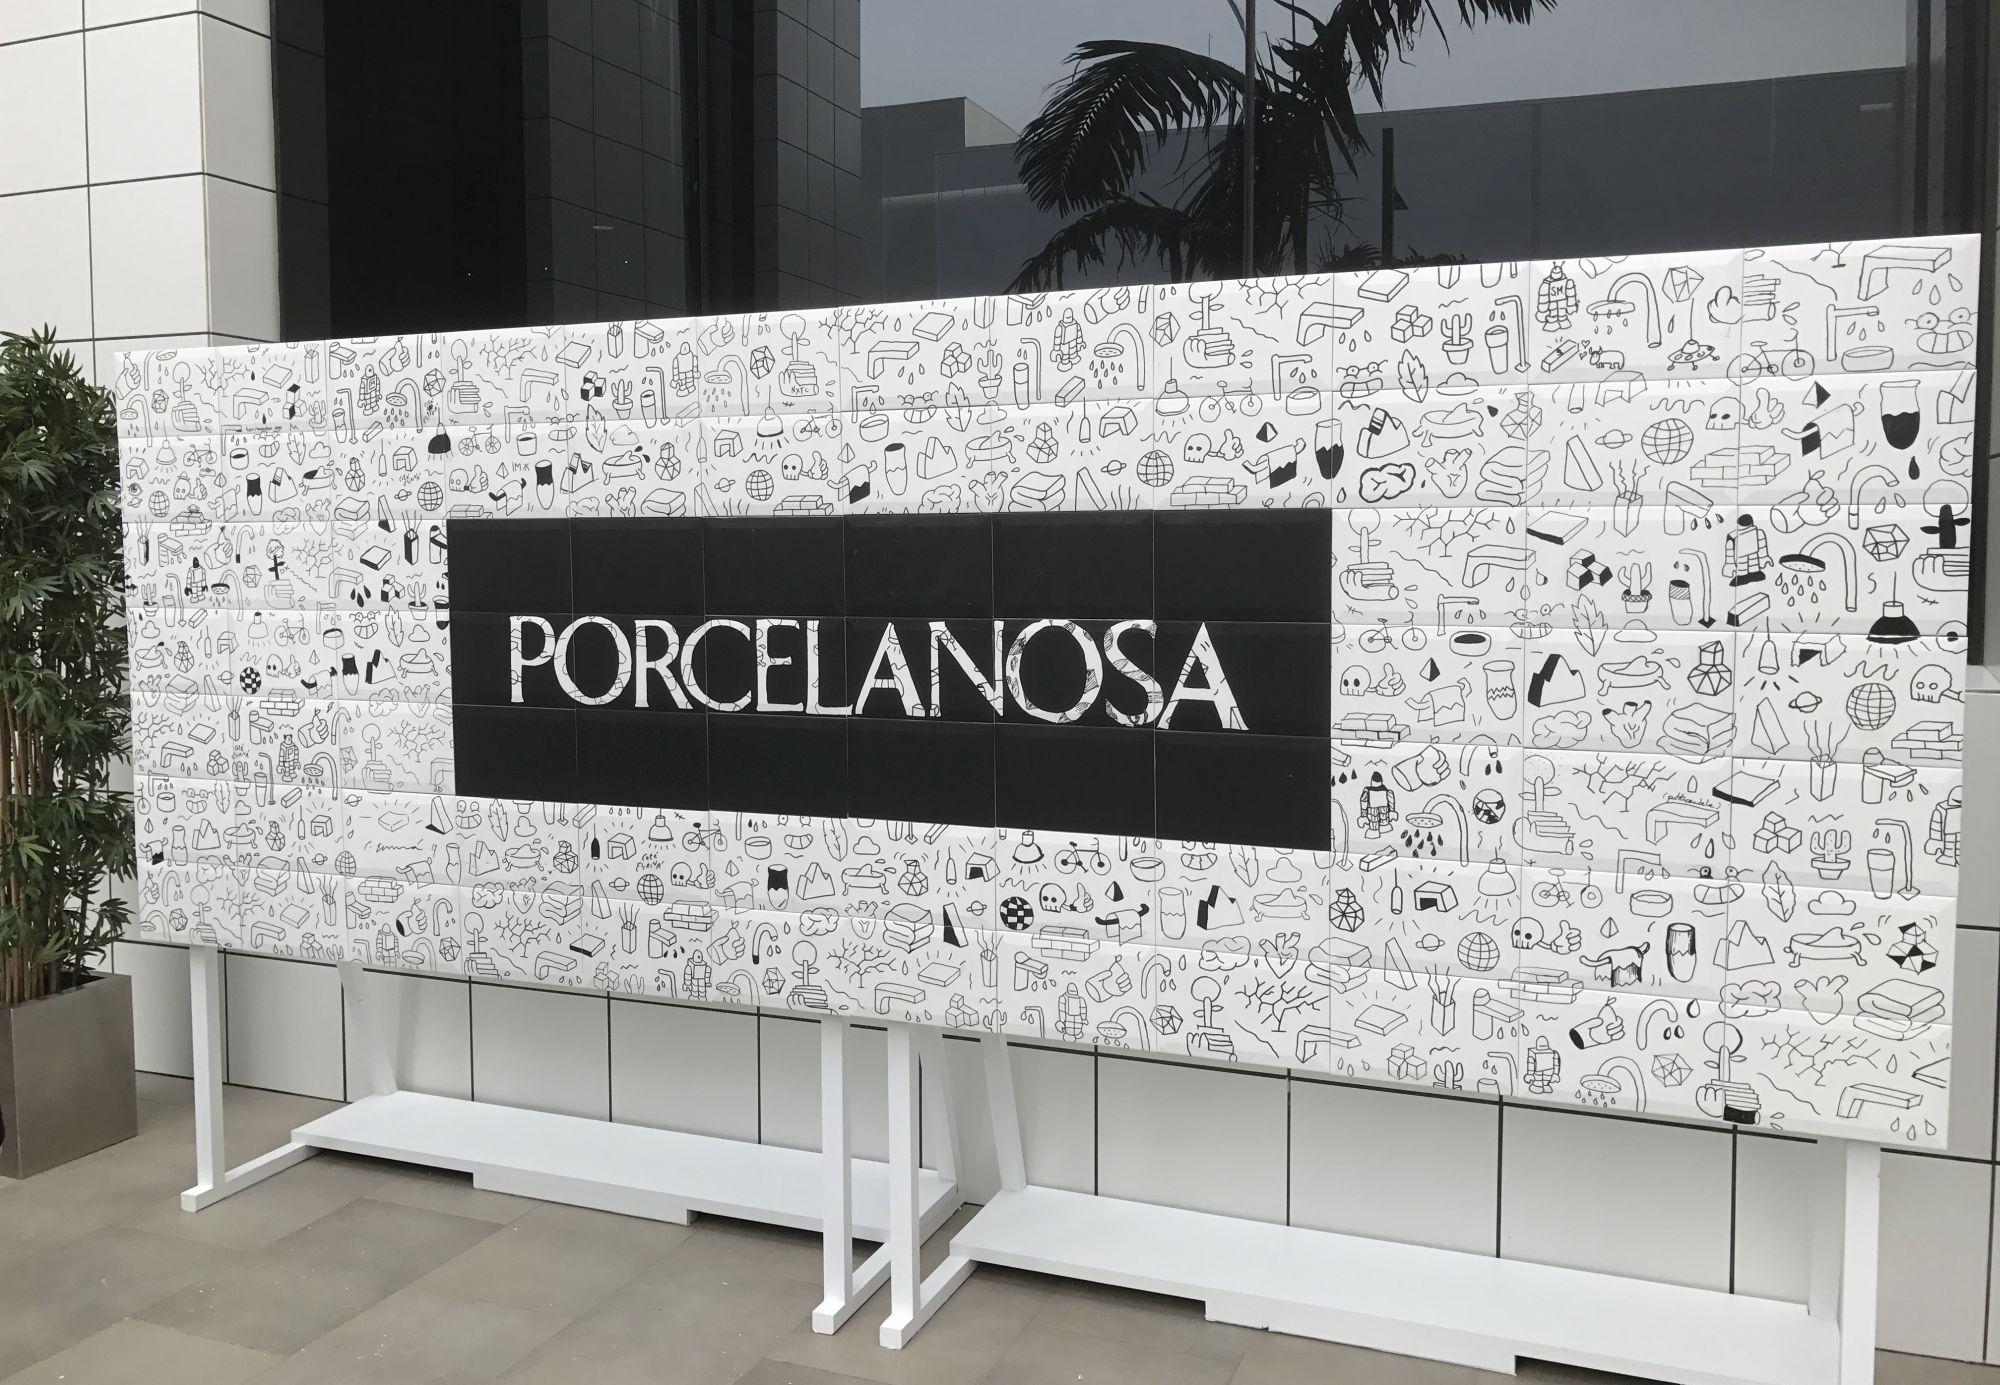 Porcelanosa - design your own tile